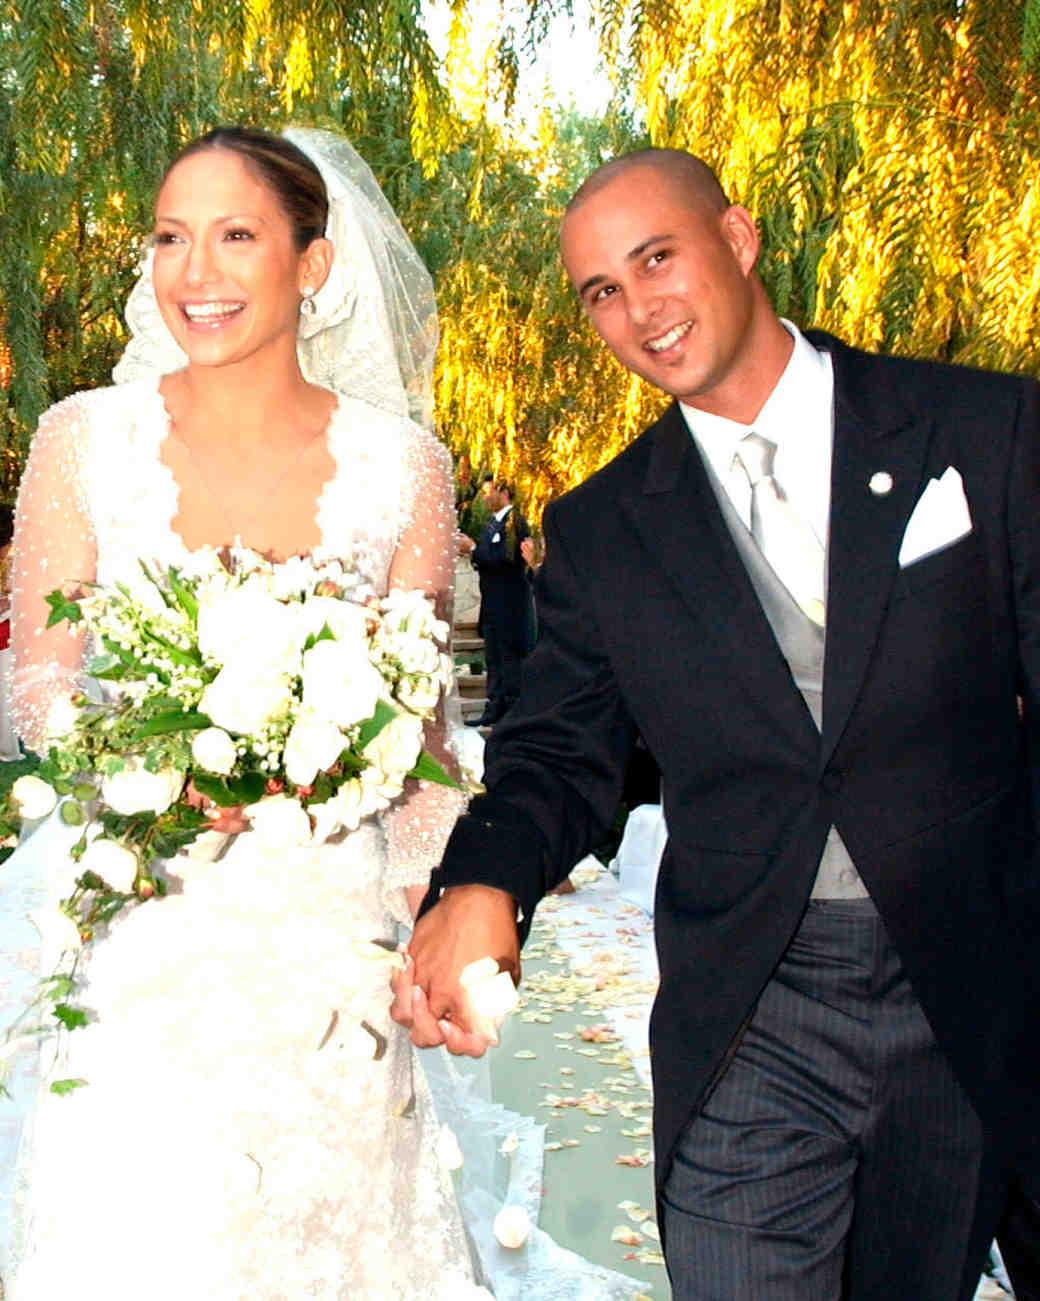 celebrity-brides-veils-jennifer-lopez-cris-judd-0615.jpg